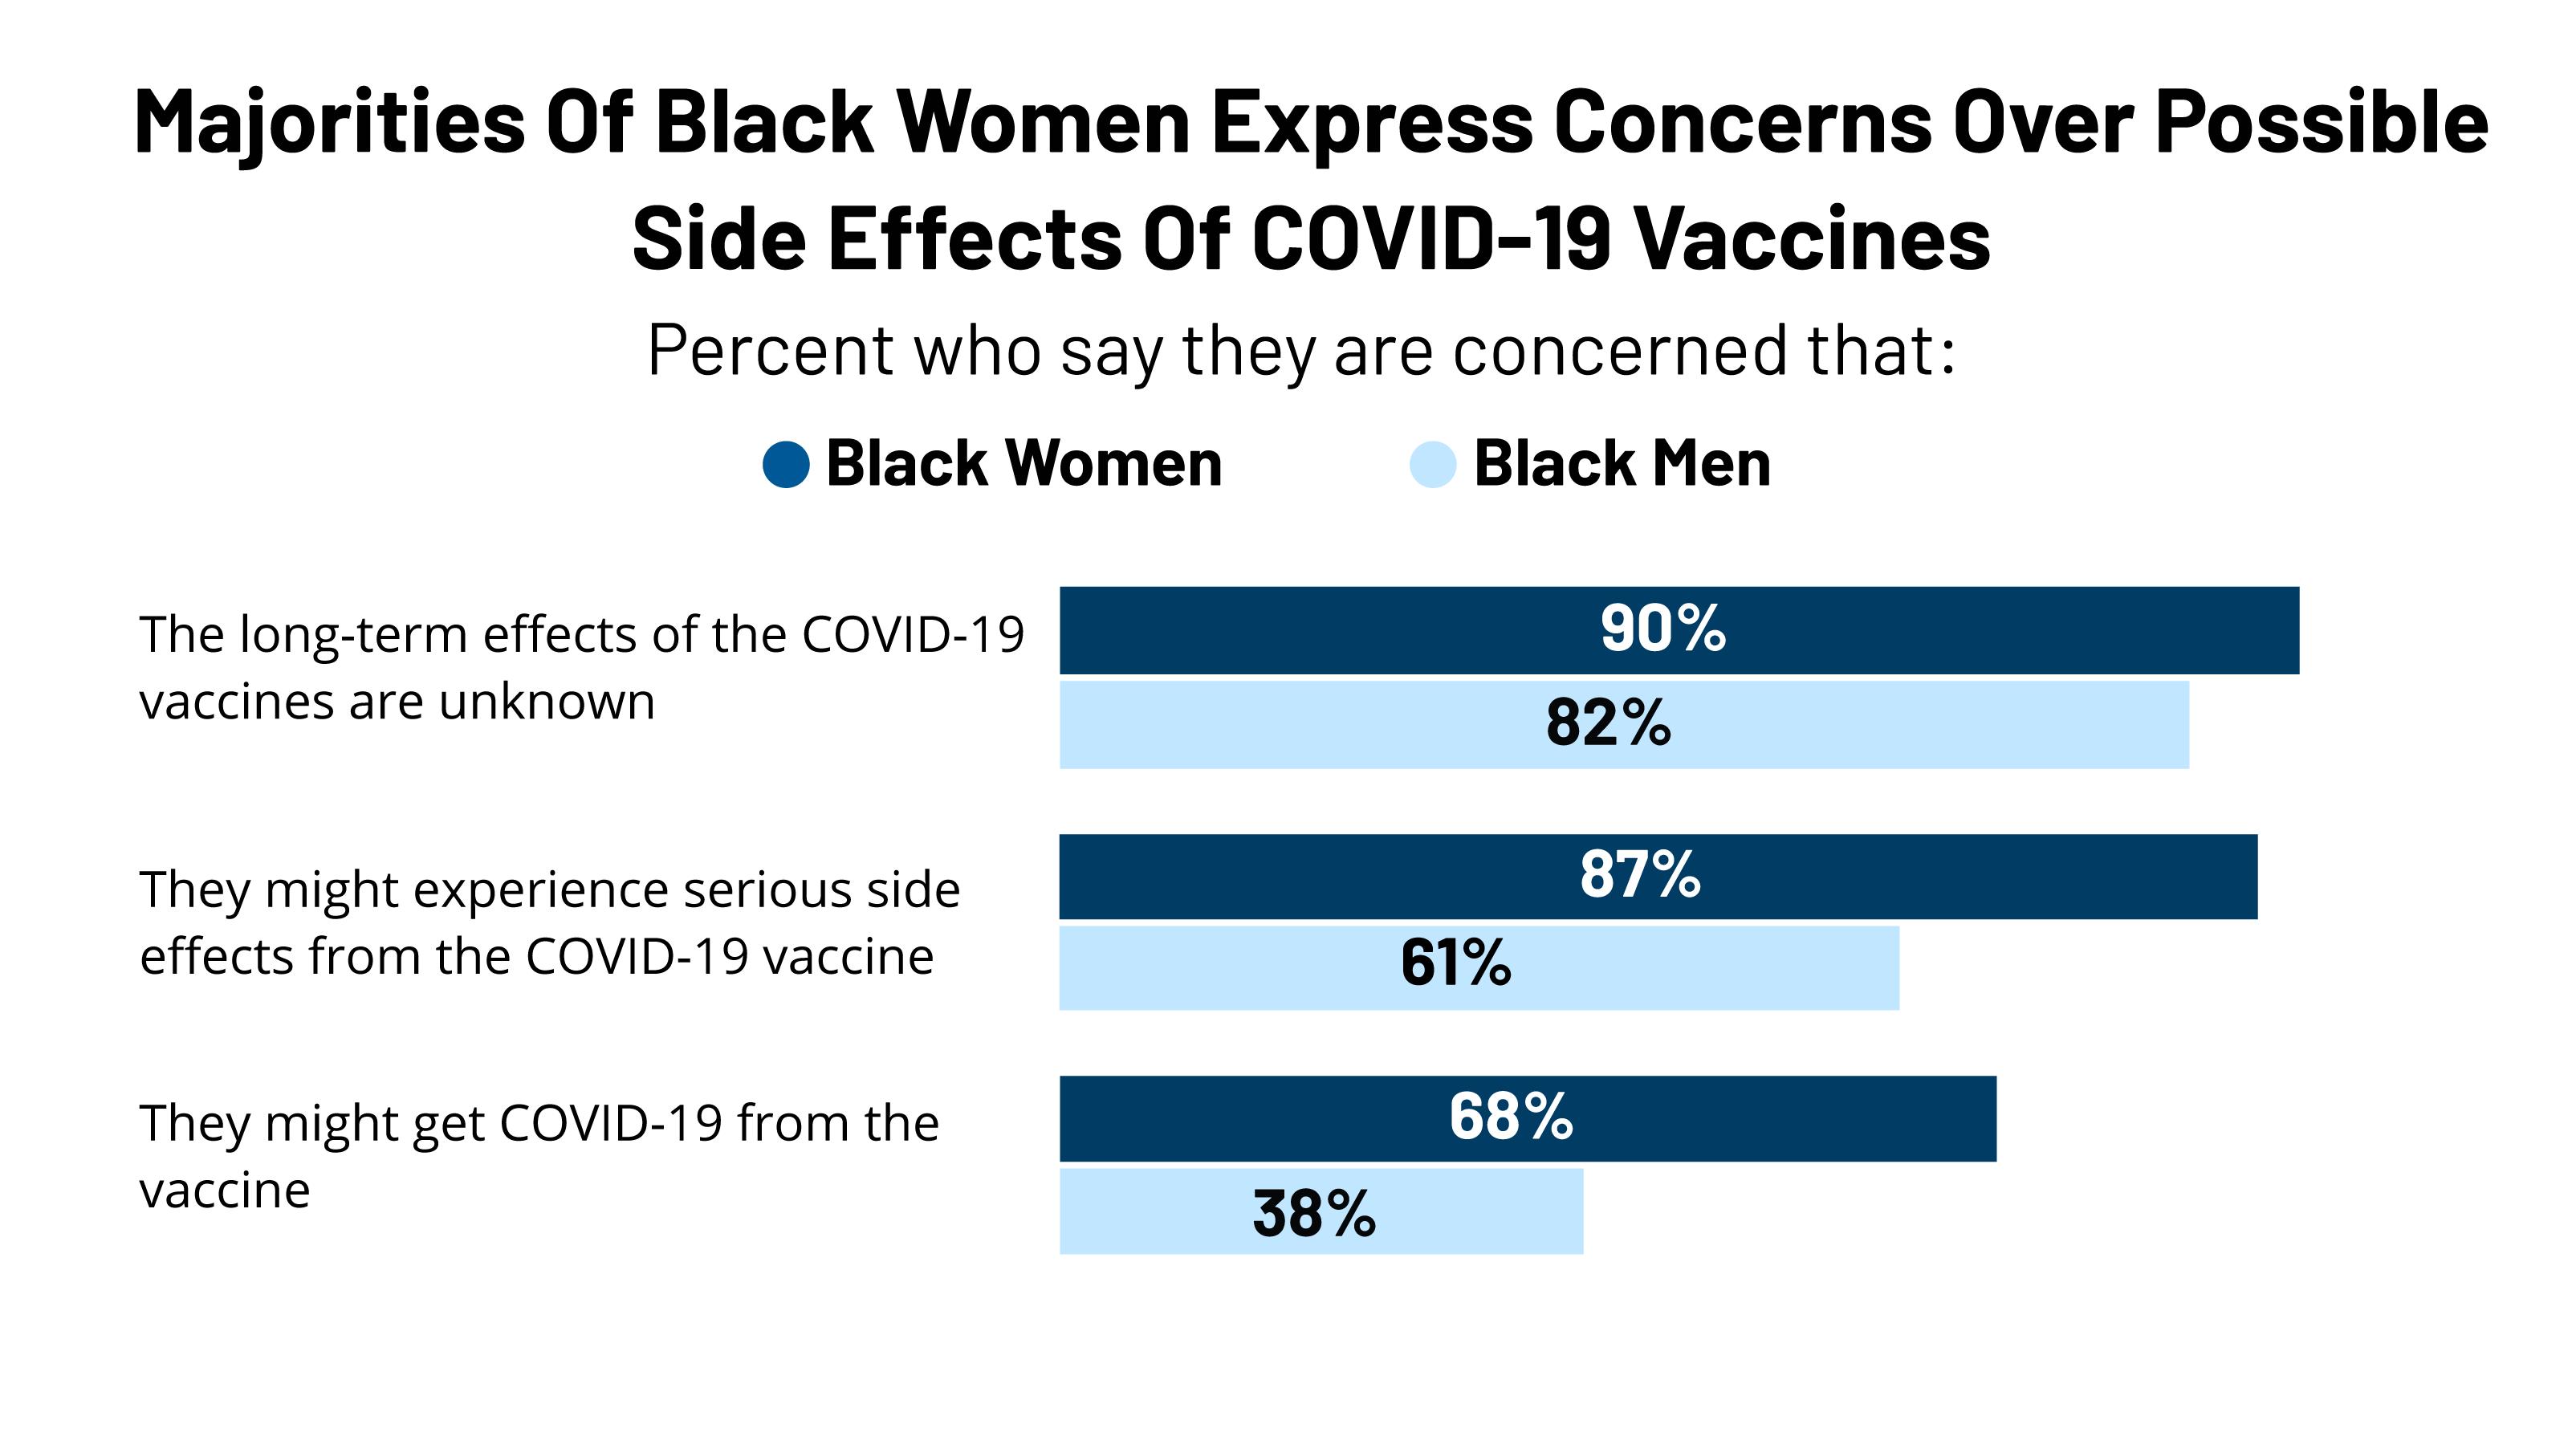 Attitudes Towards COVID-19 Vaccination Among Black Women And Men